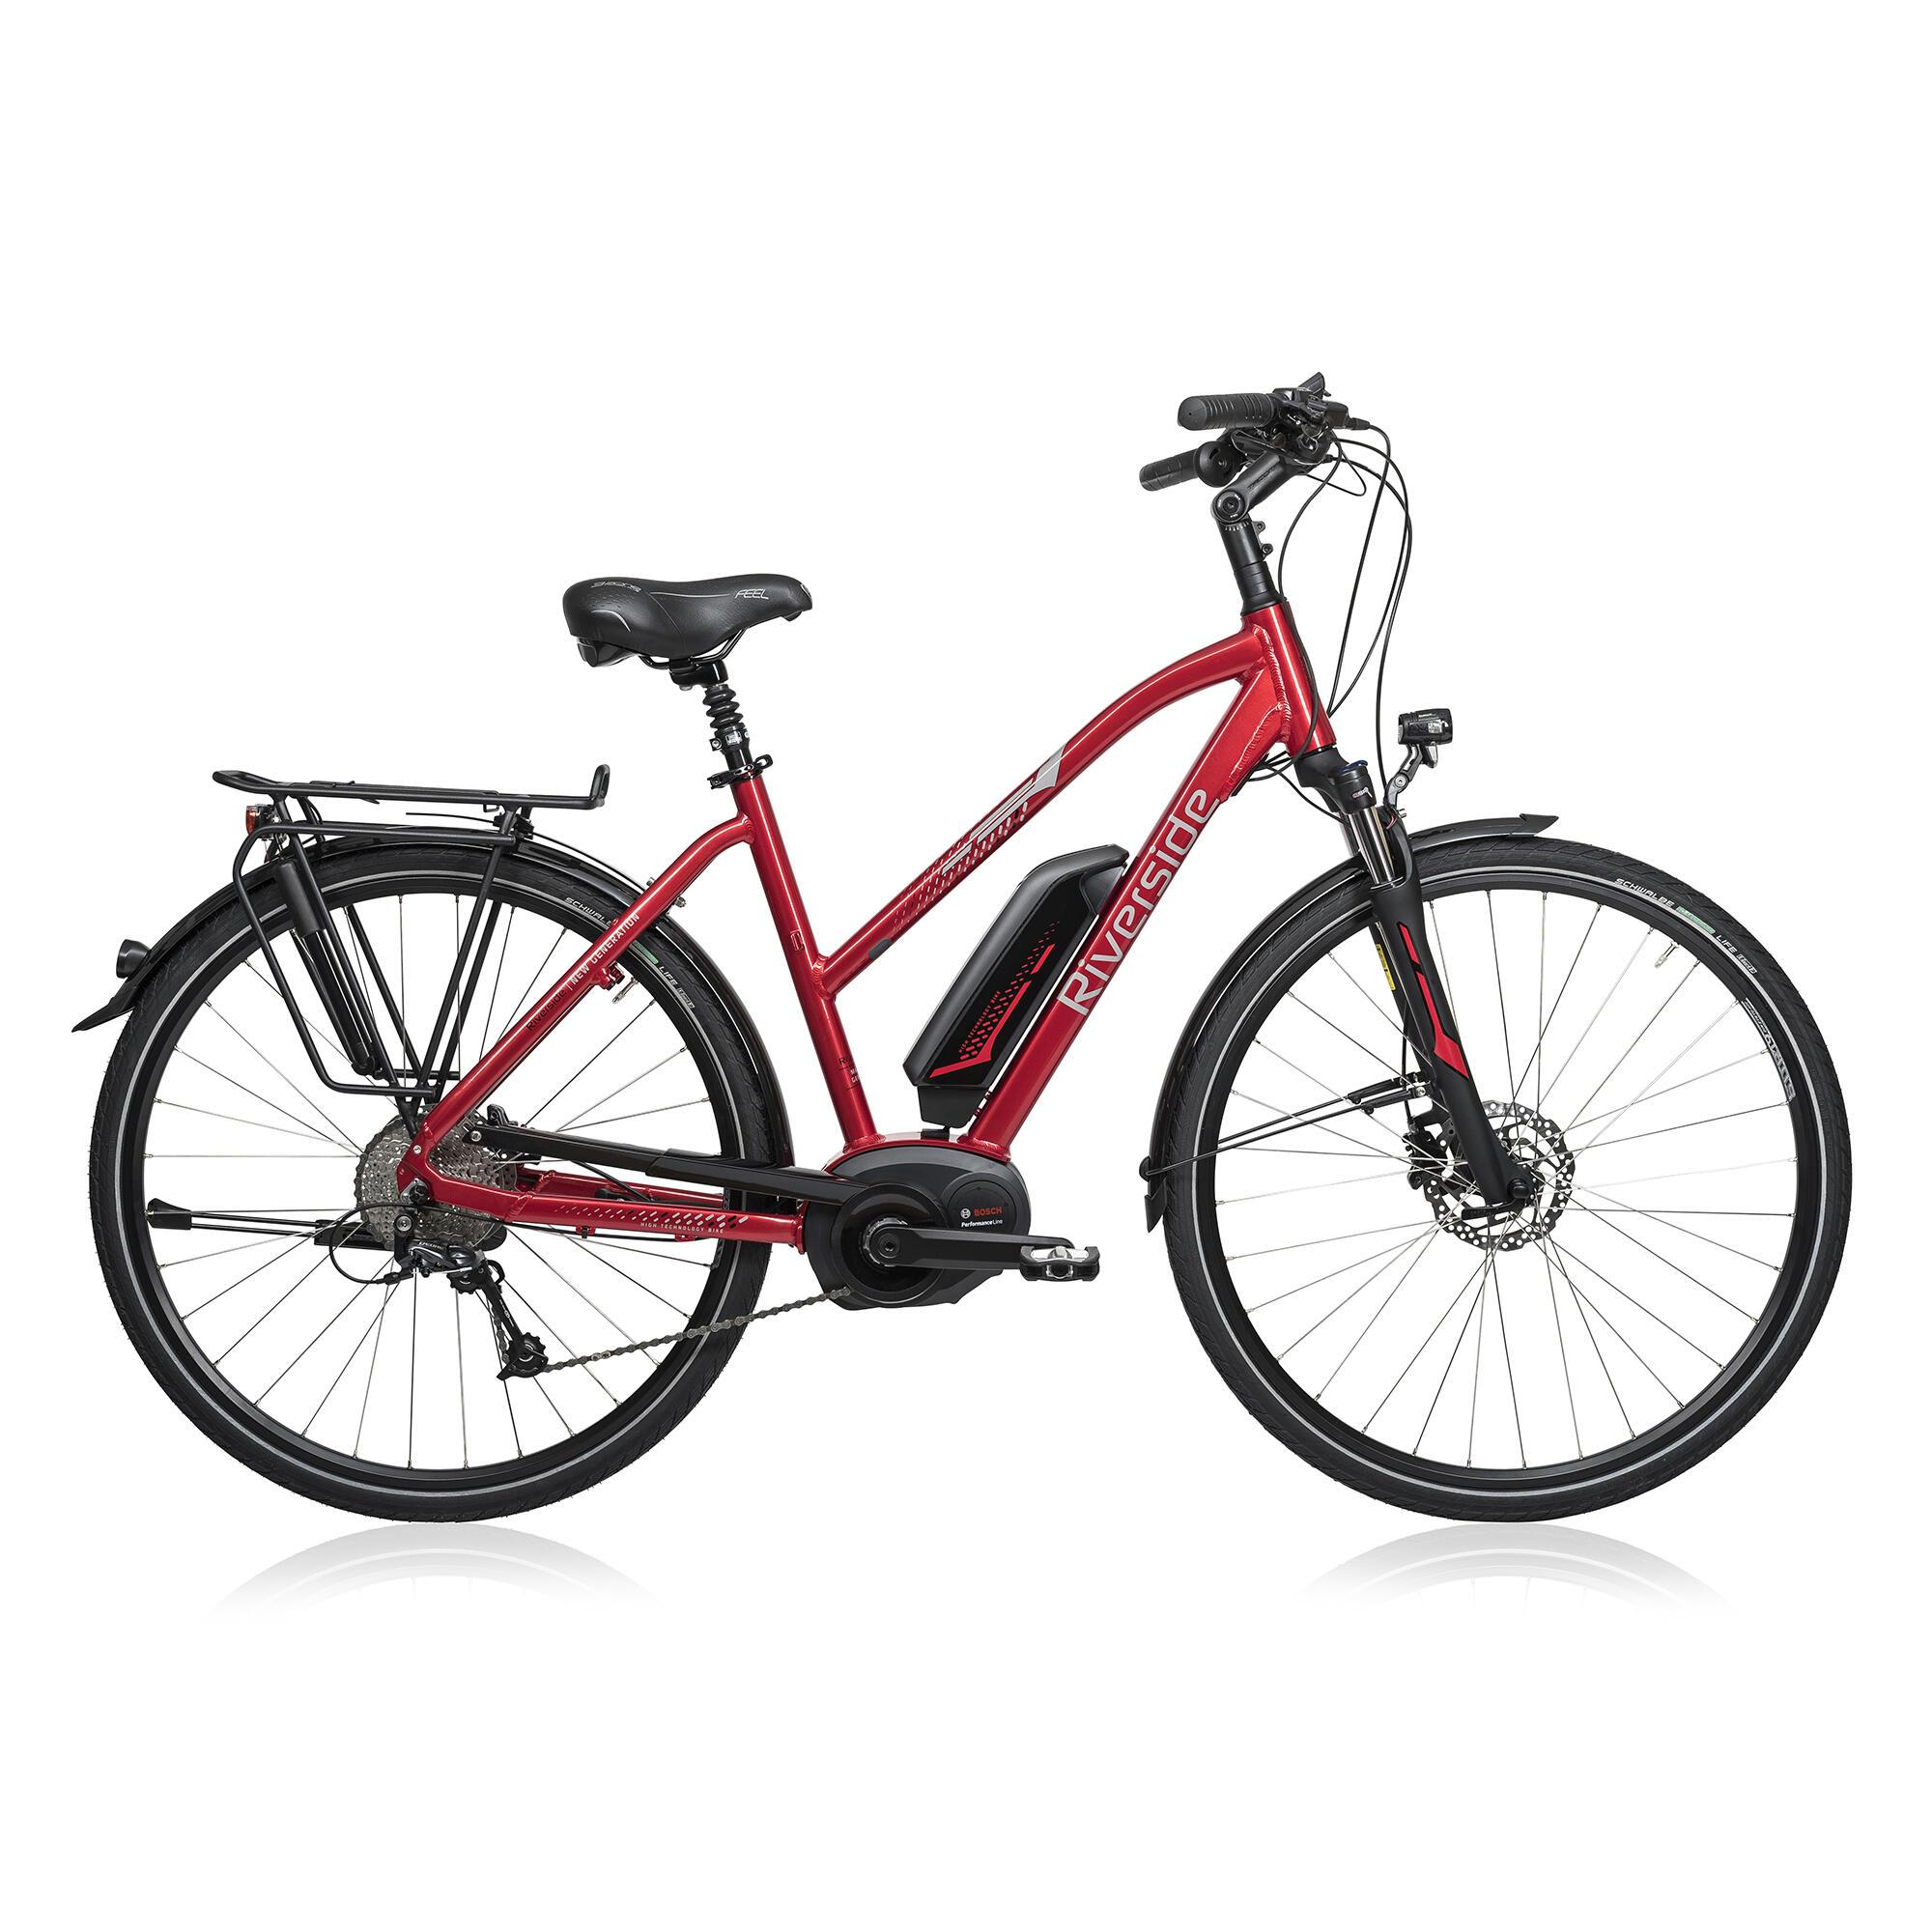 e bike 28 riverside 500 damen performance line cruise. Black Bedroom Furniture Sets. Home Design Ideas